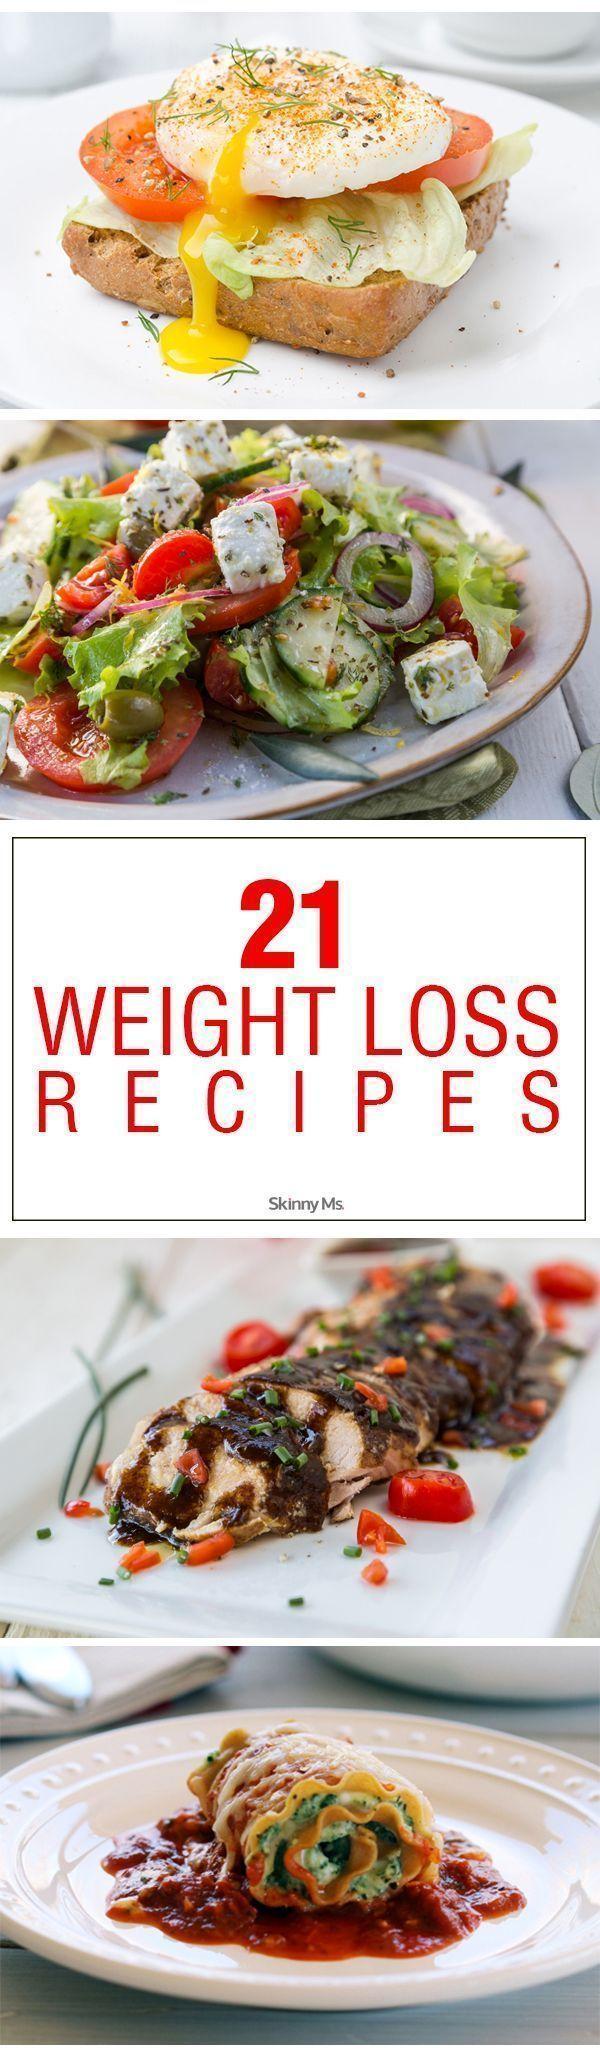 21 Weight Loss Recipes!  #weightlossrecipes #menuplanning